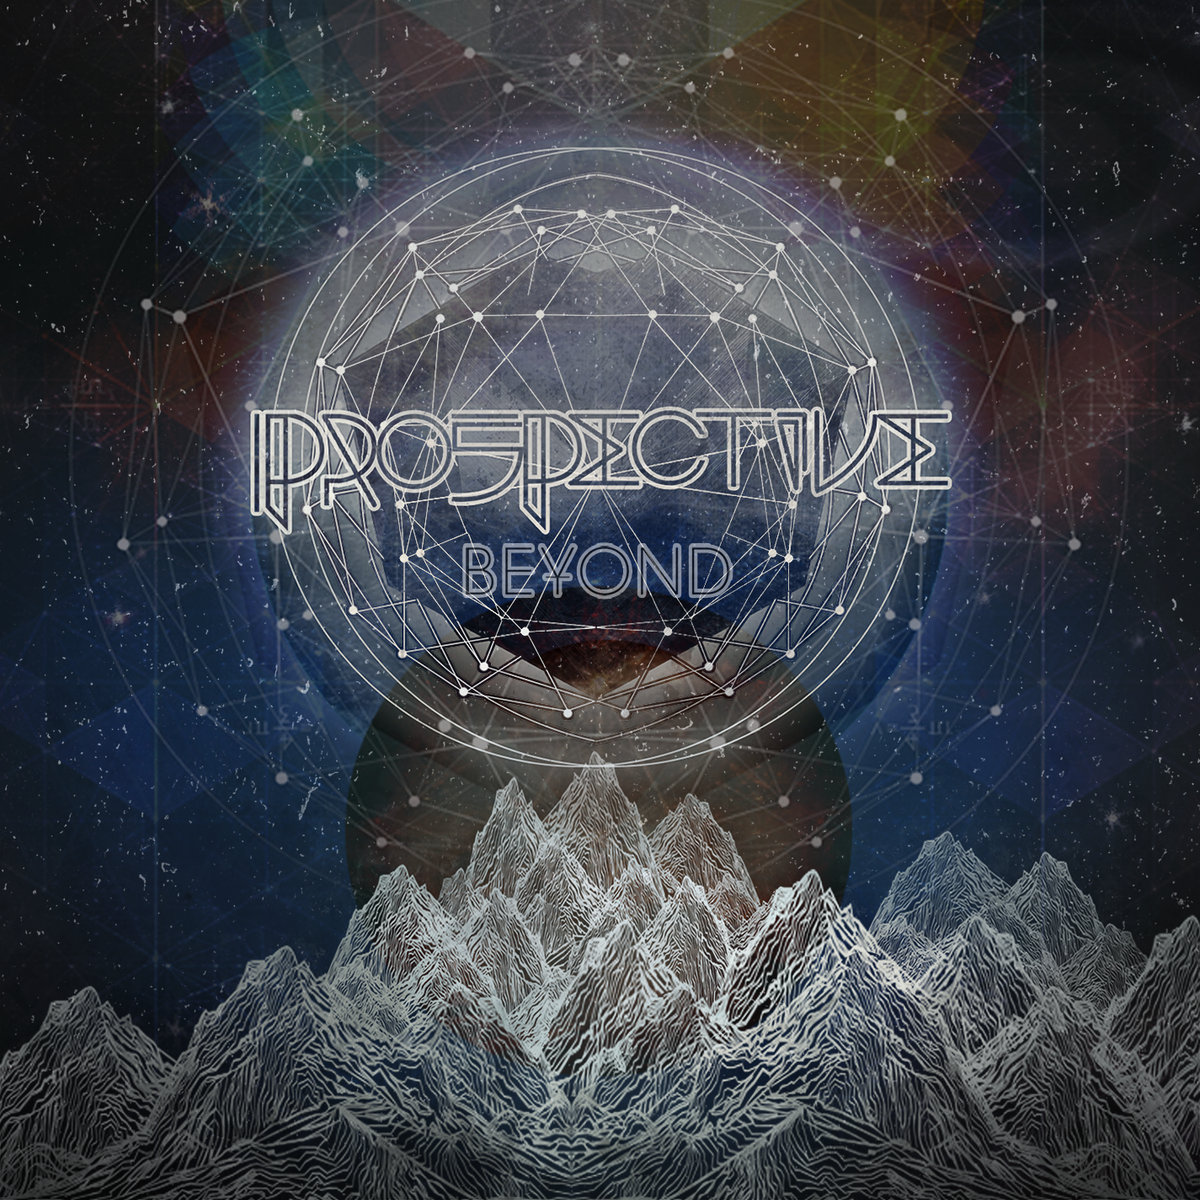 Prospective – Beyond